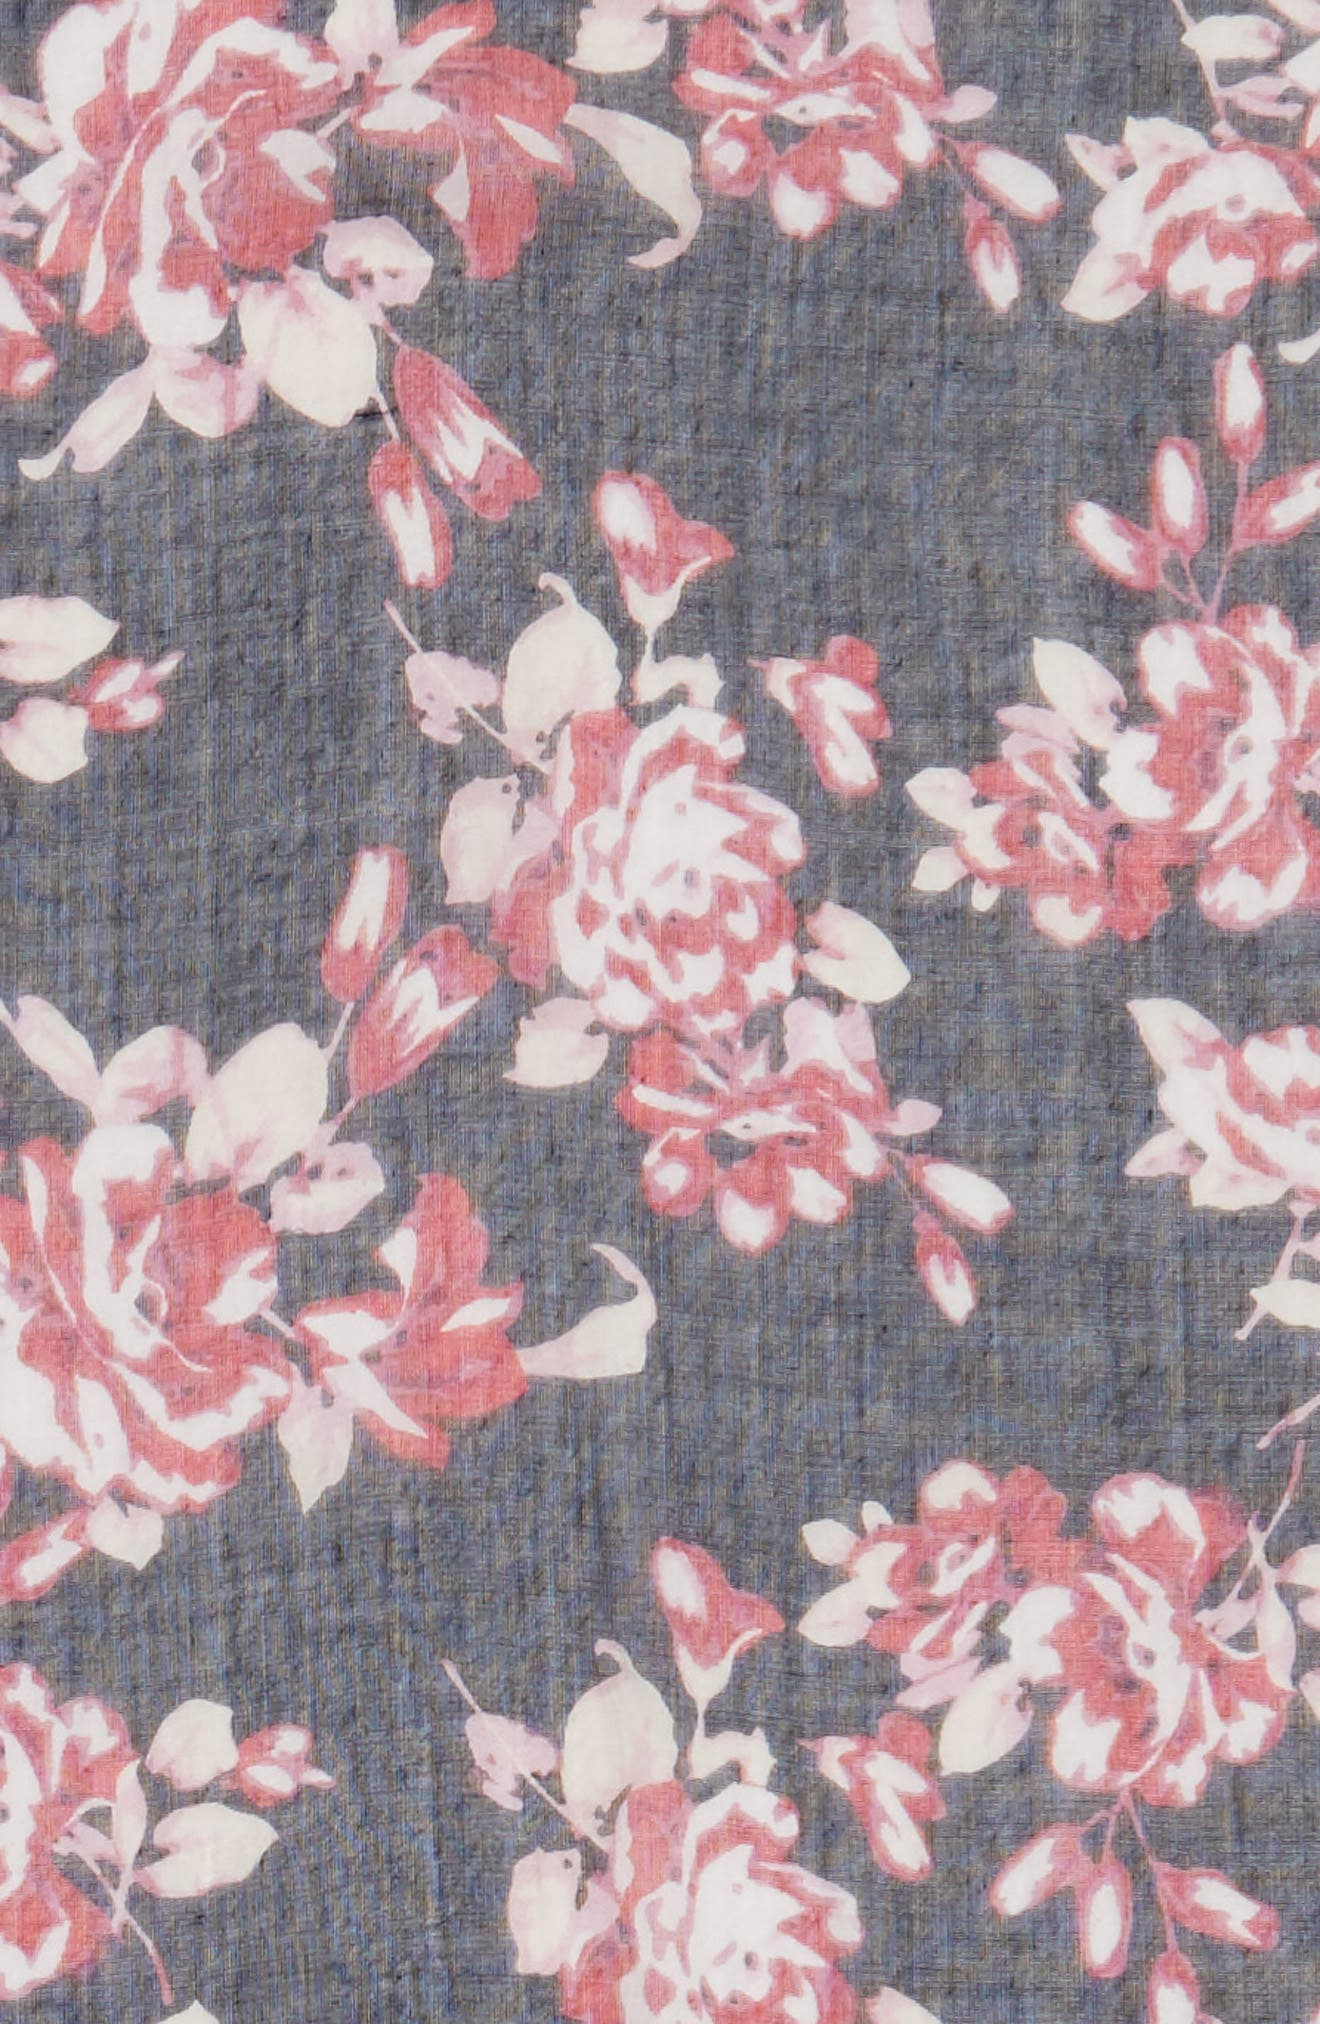 Floral Print Scarf,                             Alternate thumbnail 4, color,                             400